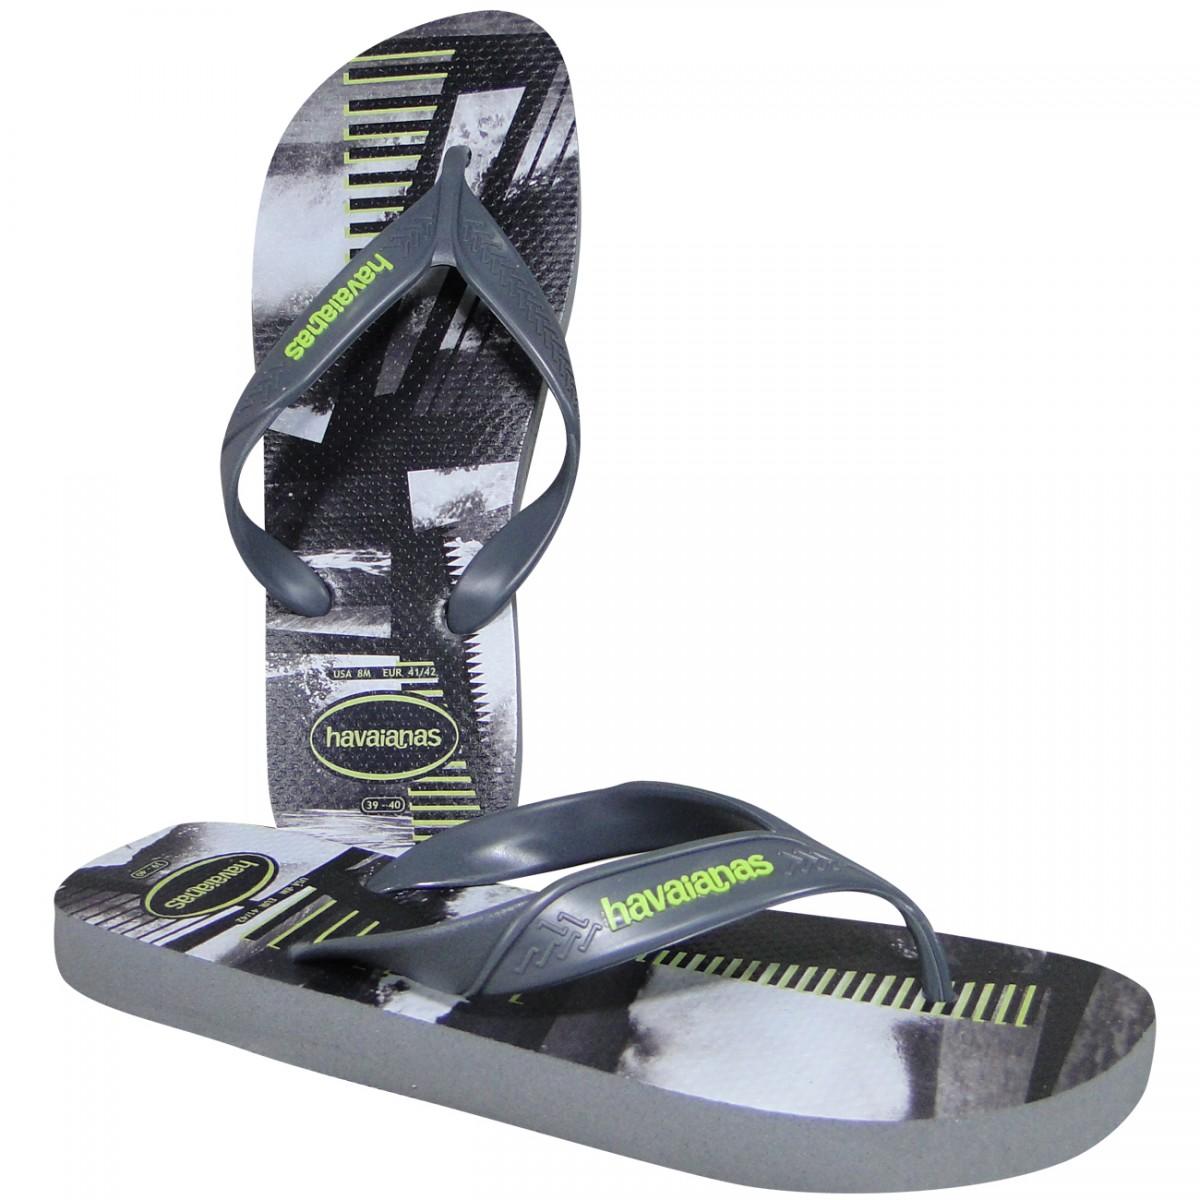 efccb0d4d7c876 Chinelo Havaianas Surf 4.000.047 5178 - Cinza Aço - Chuteira Nike ...